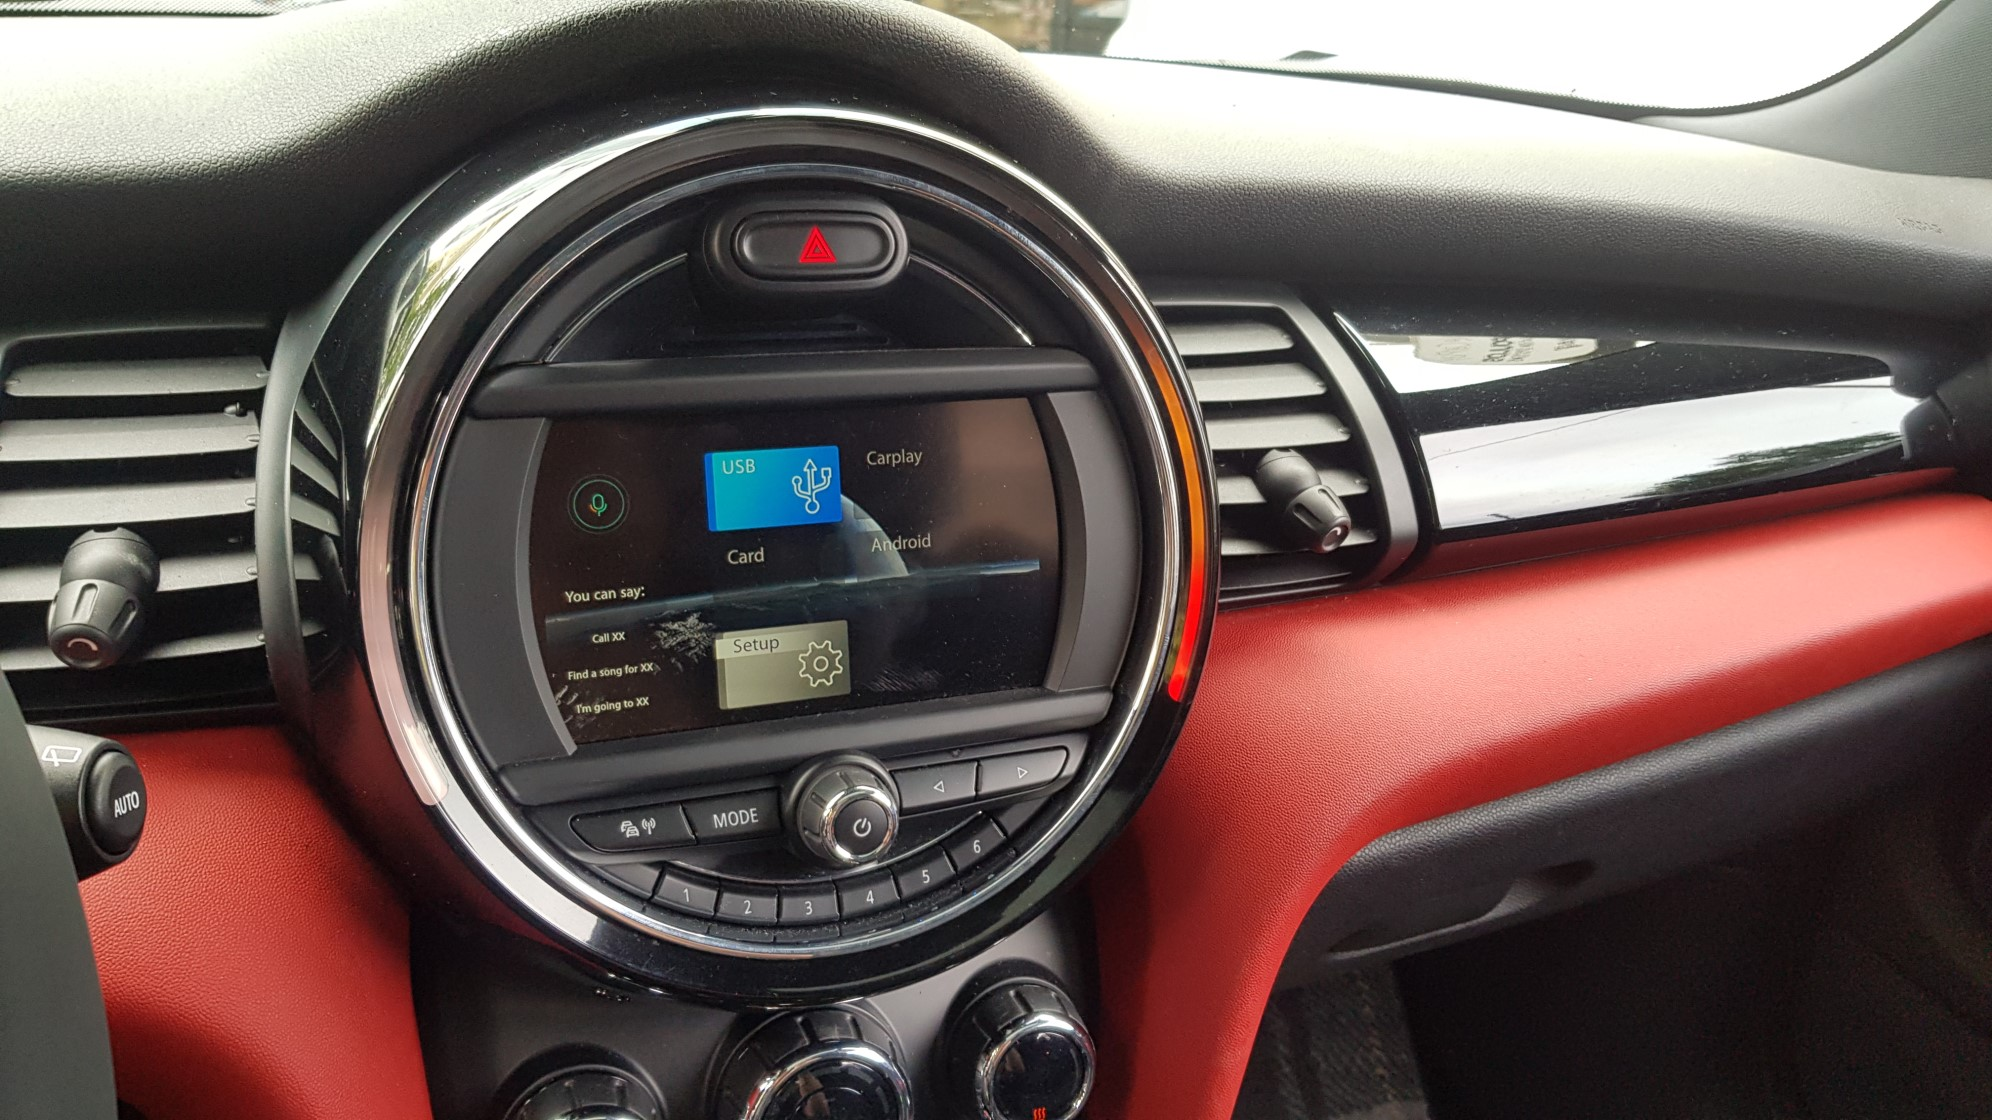 Mini Cooper F-56  Wireless Apple Car Play, Android Auto, Media